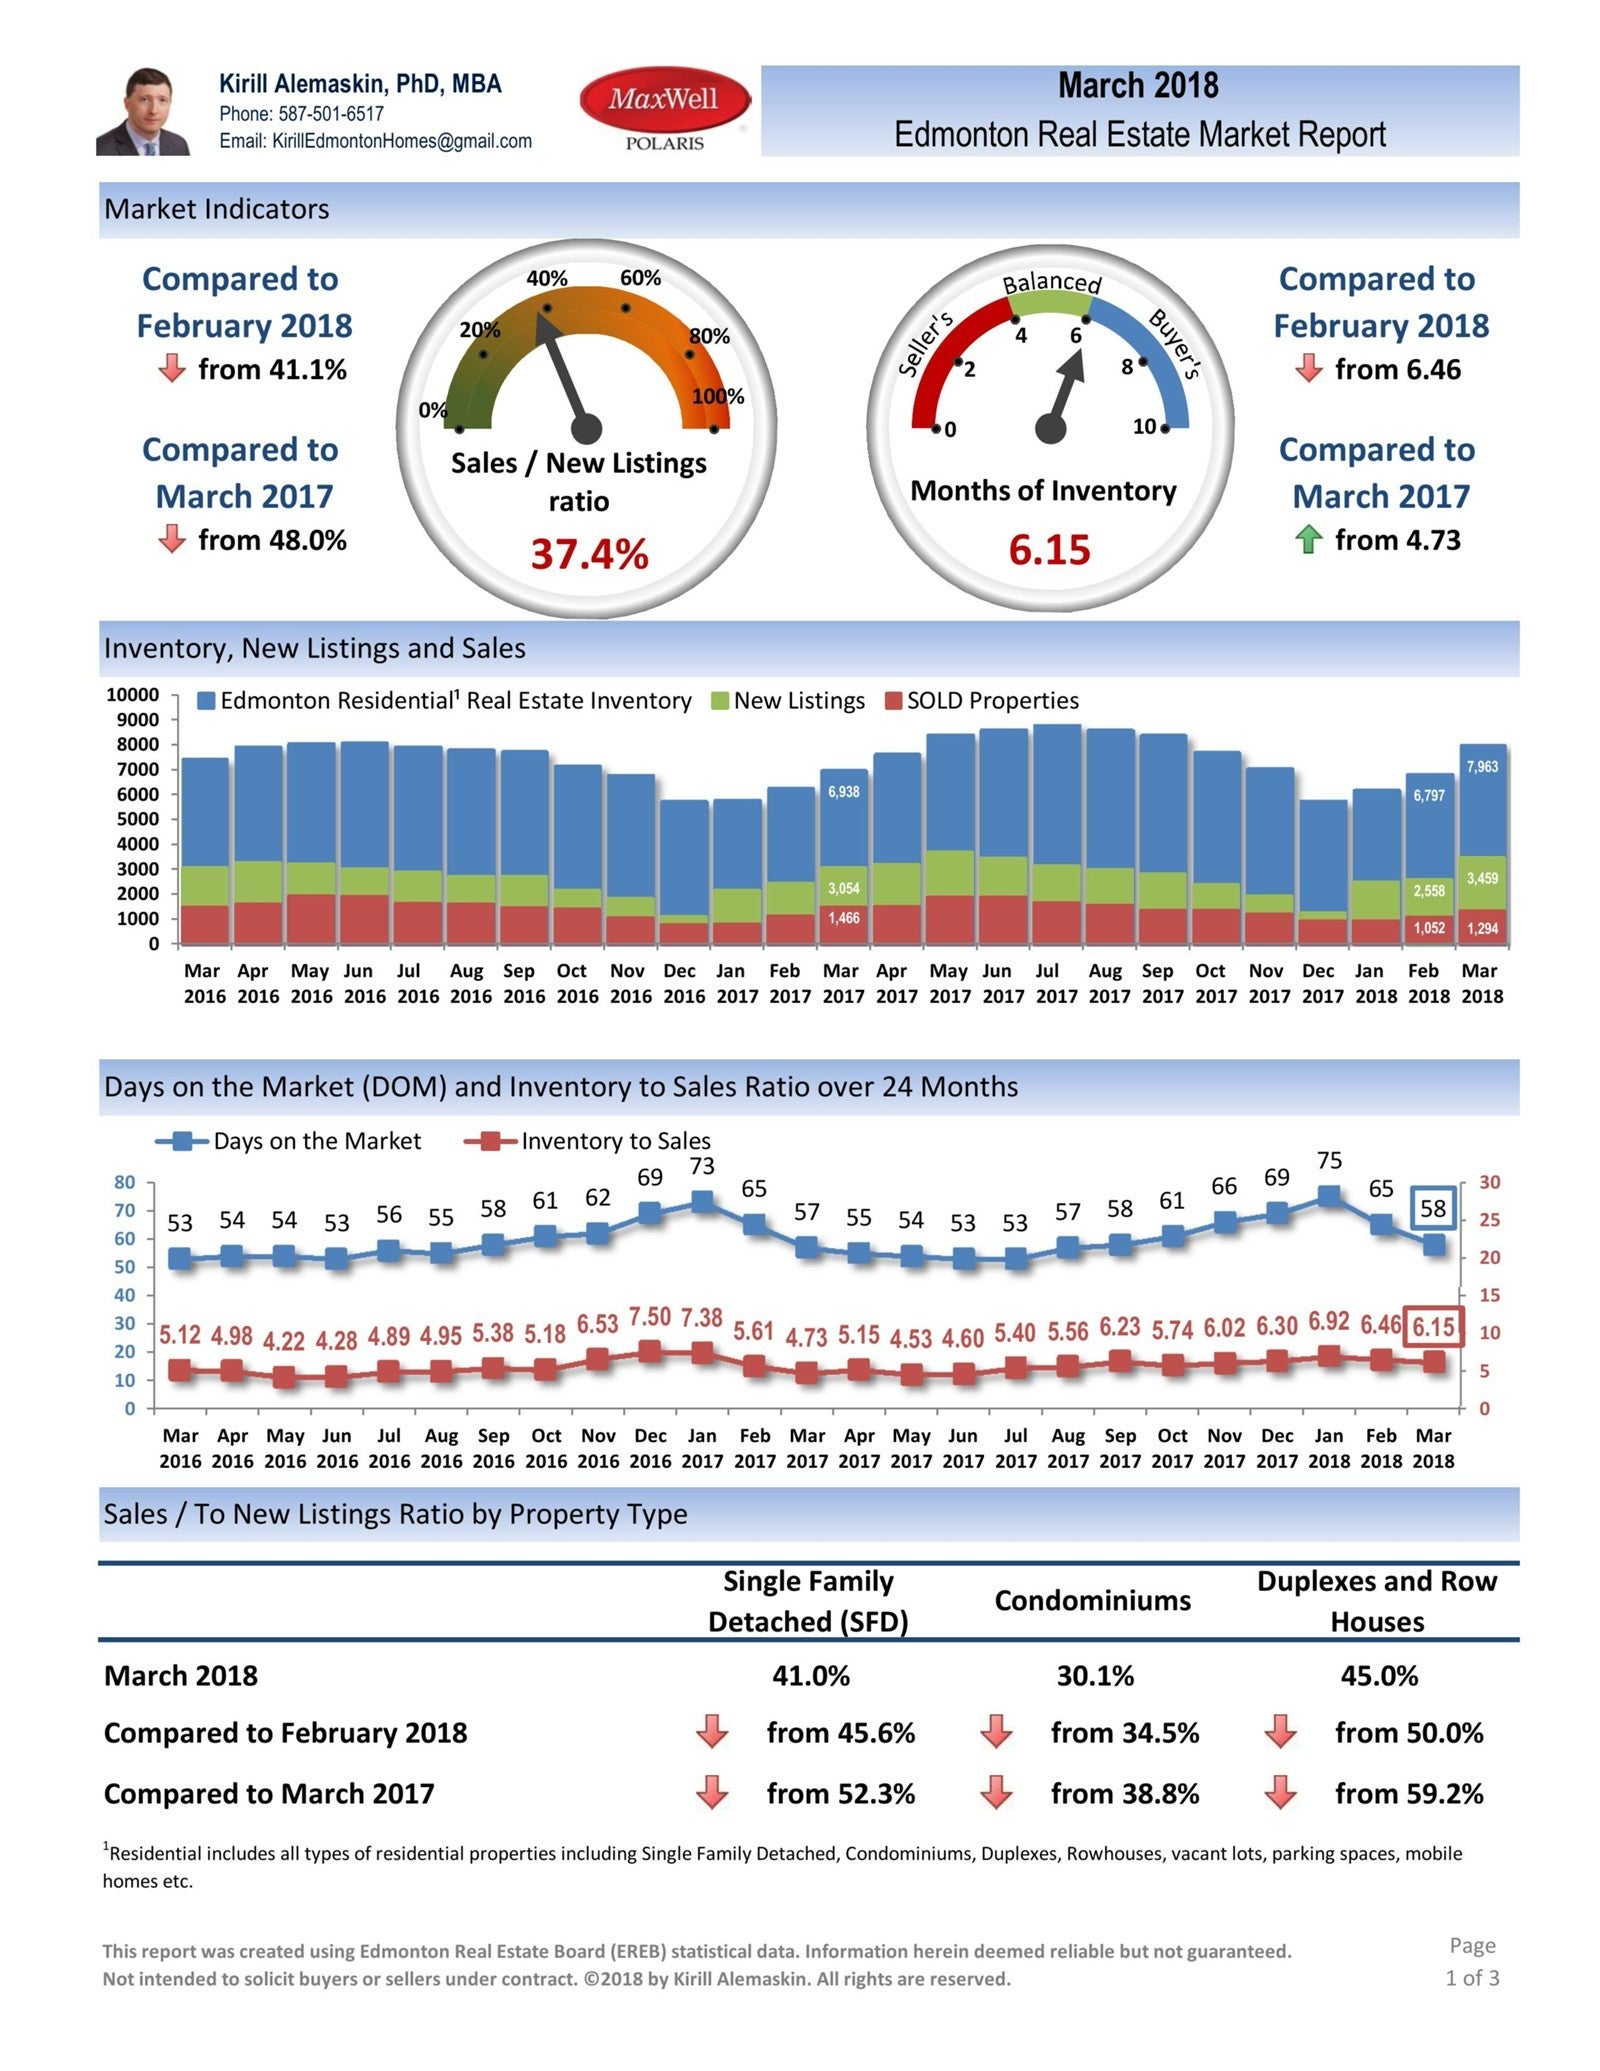 Preview: Edmonton Real Estate Market Report - March 2018